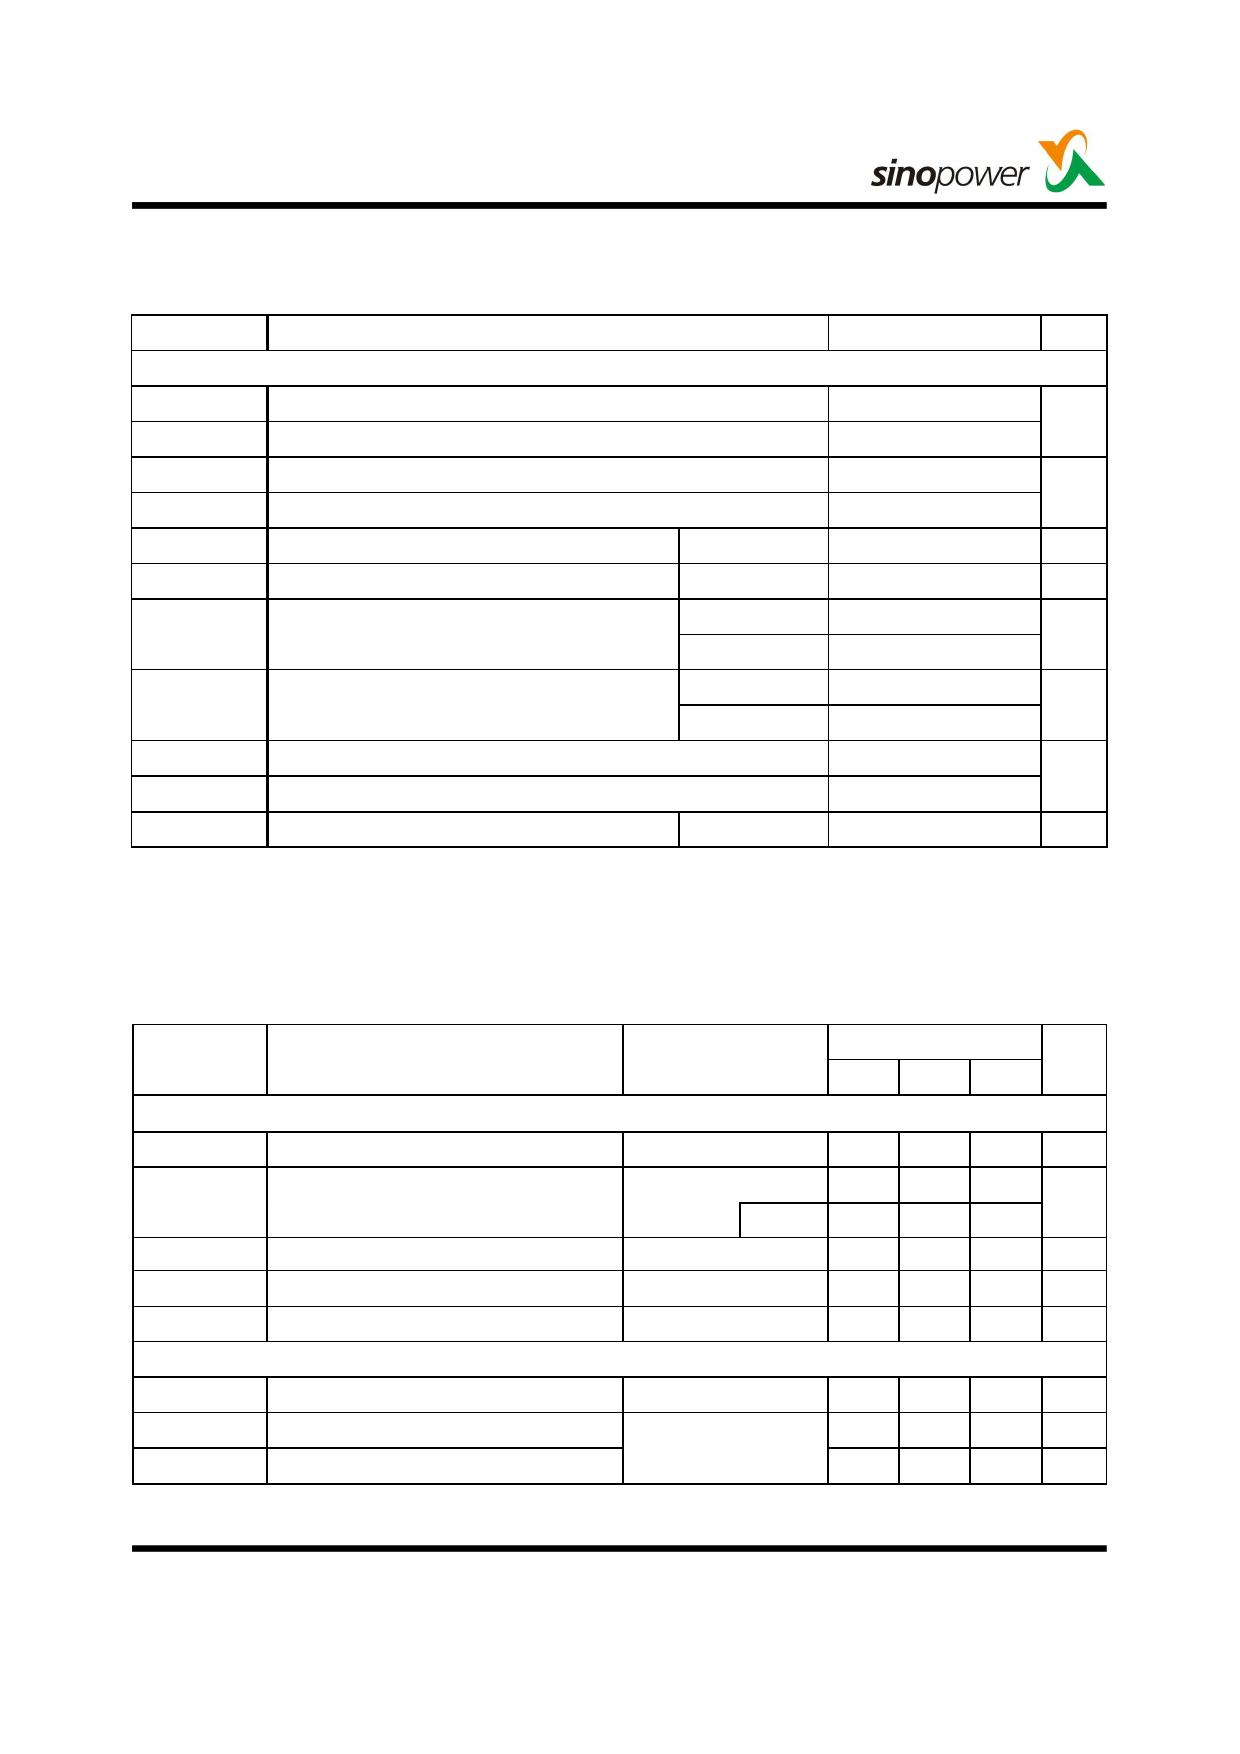 SM8007NSF pdf, equivalent, schematic